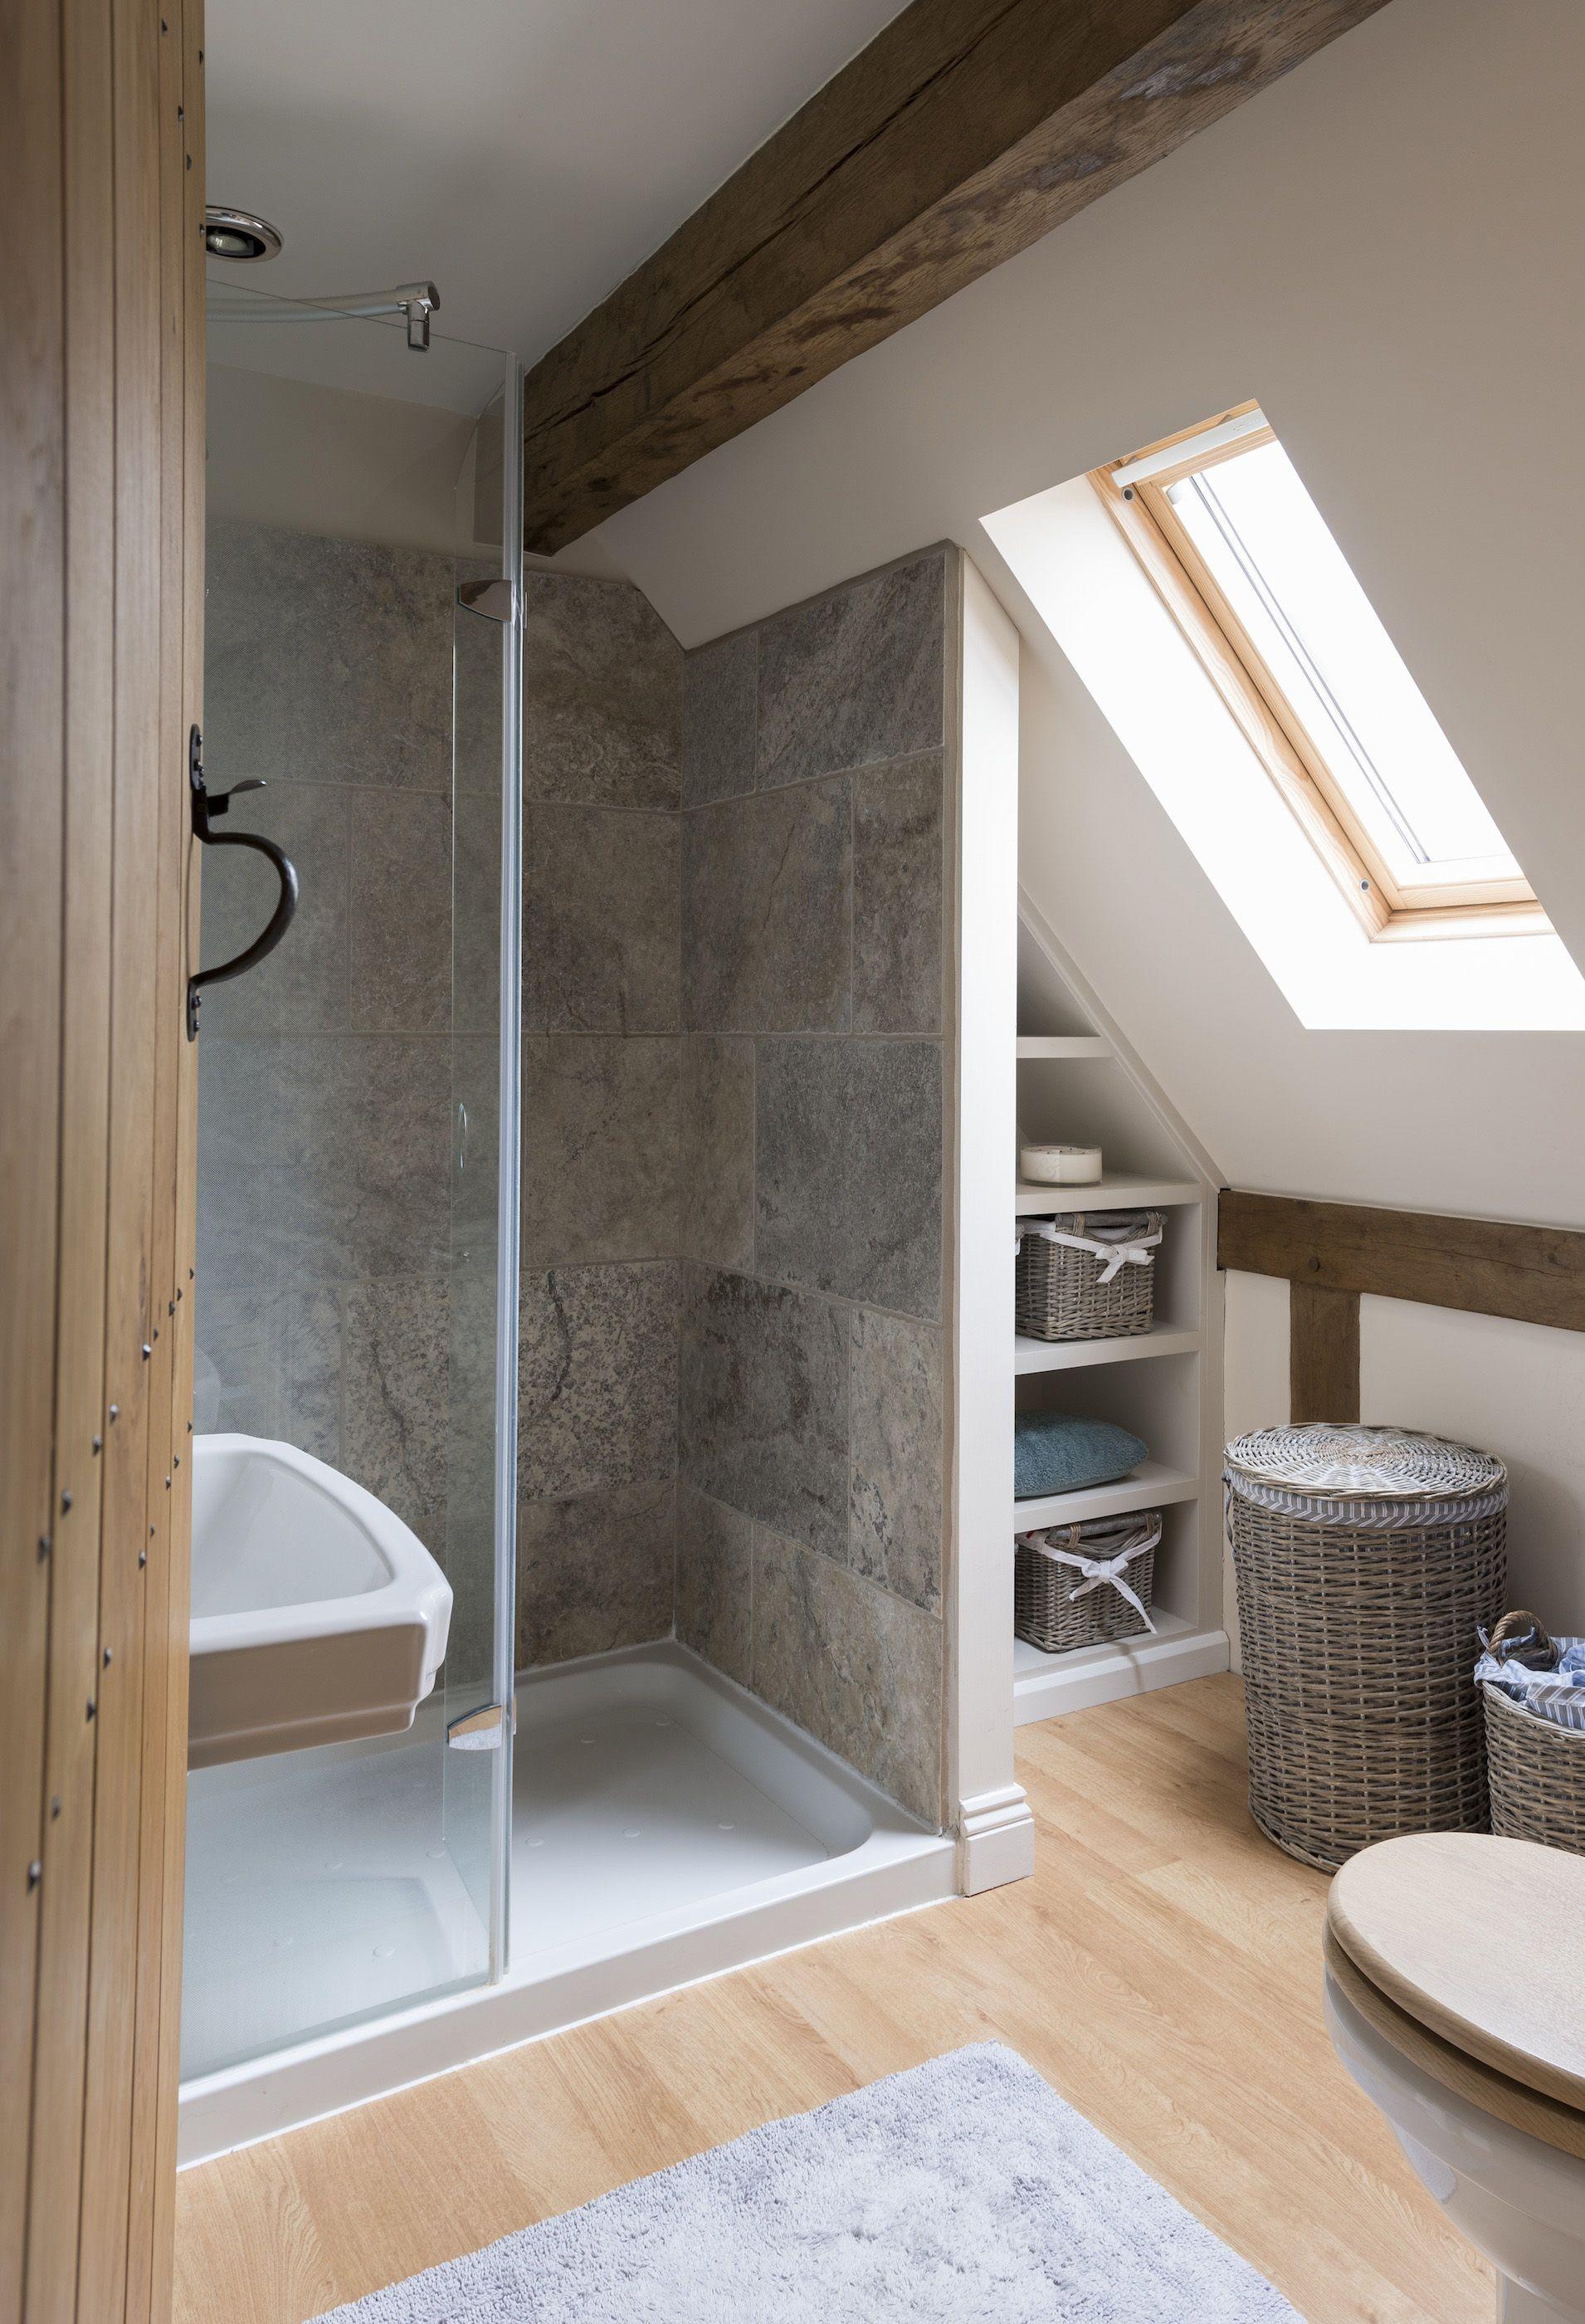 sloping walls Loft bathroom, Loft room, Bathrooms remodel